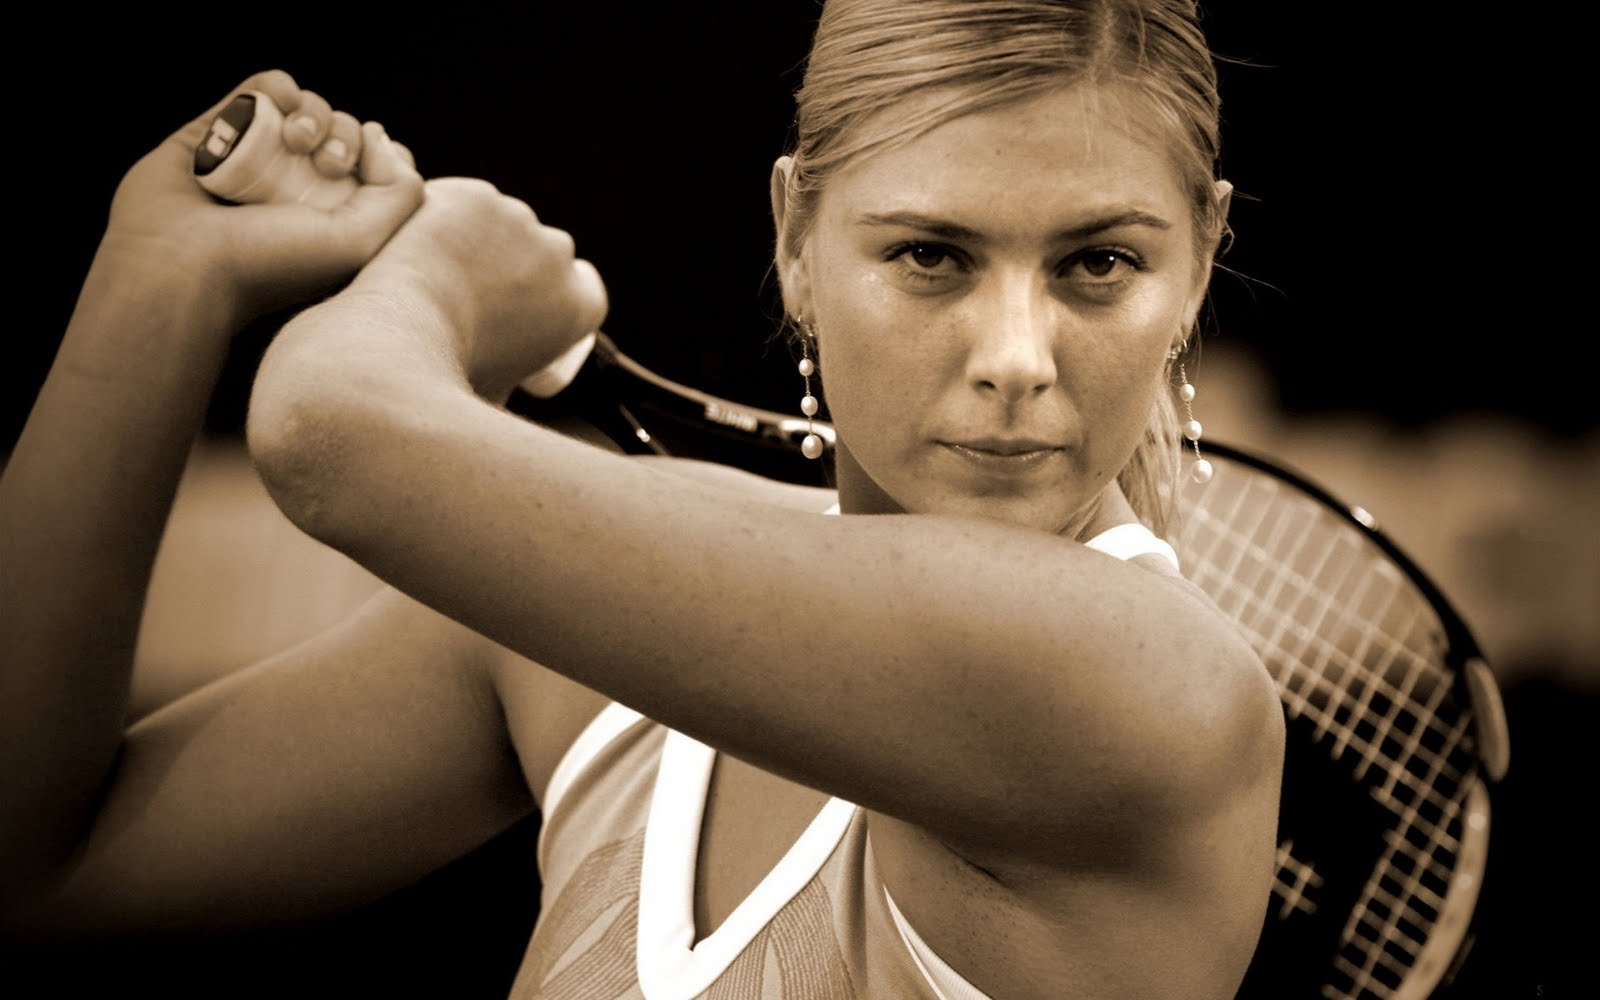 http://3.bp.blogspot.com/--CAlb97UaH8/TnELZX_I6tI/AAAAAAAAE_I/Qfpwnta8khU/s1600/Maria+sharapova+tennis+wallpapers+4.jpg#sharapova%20tennis%201600x1000